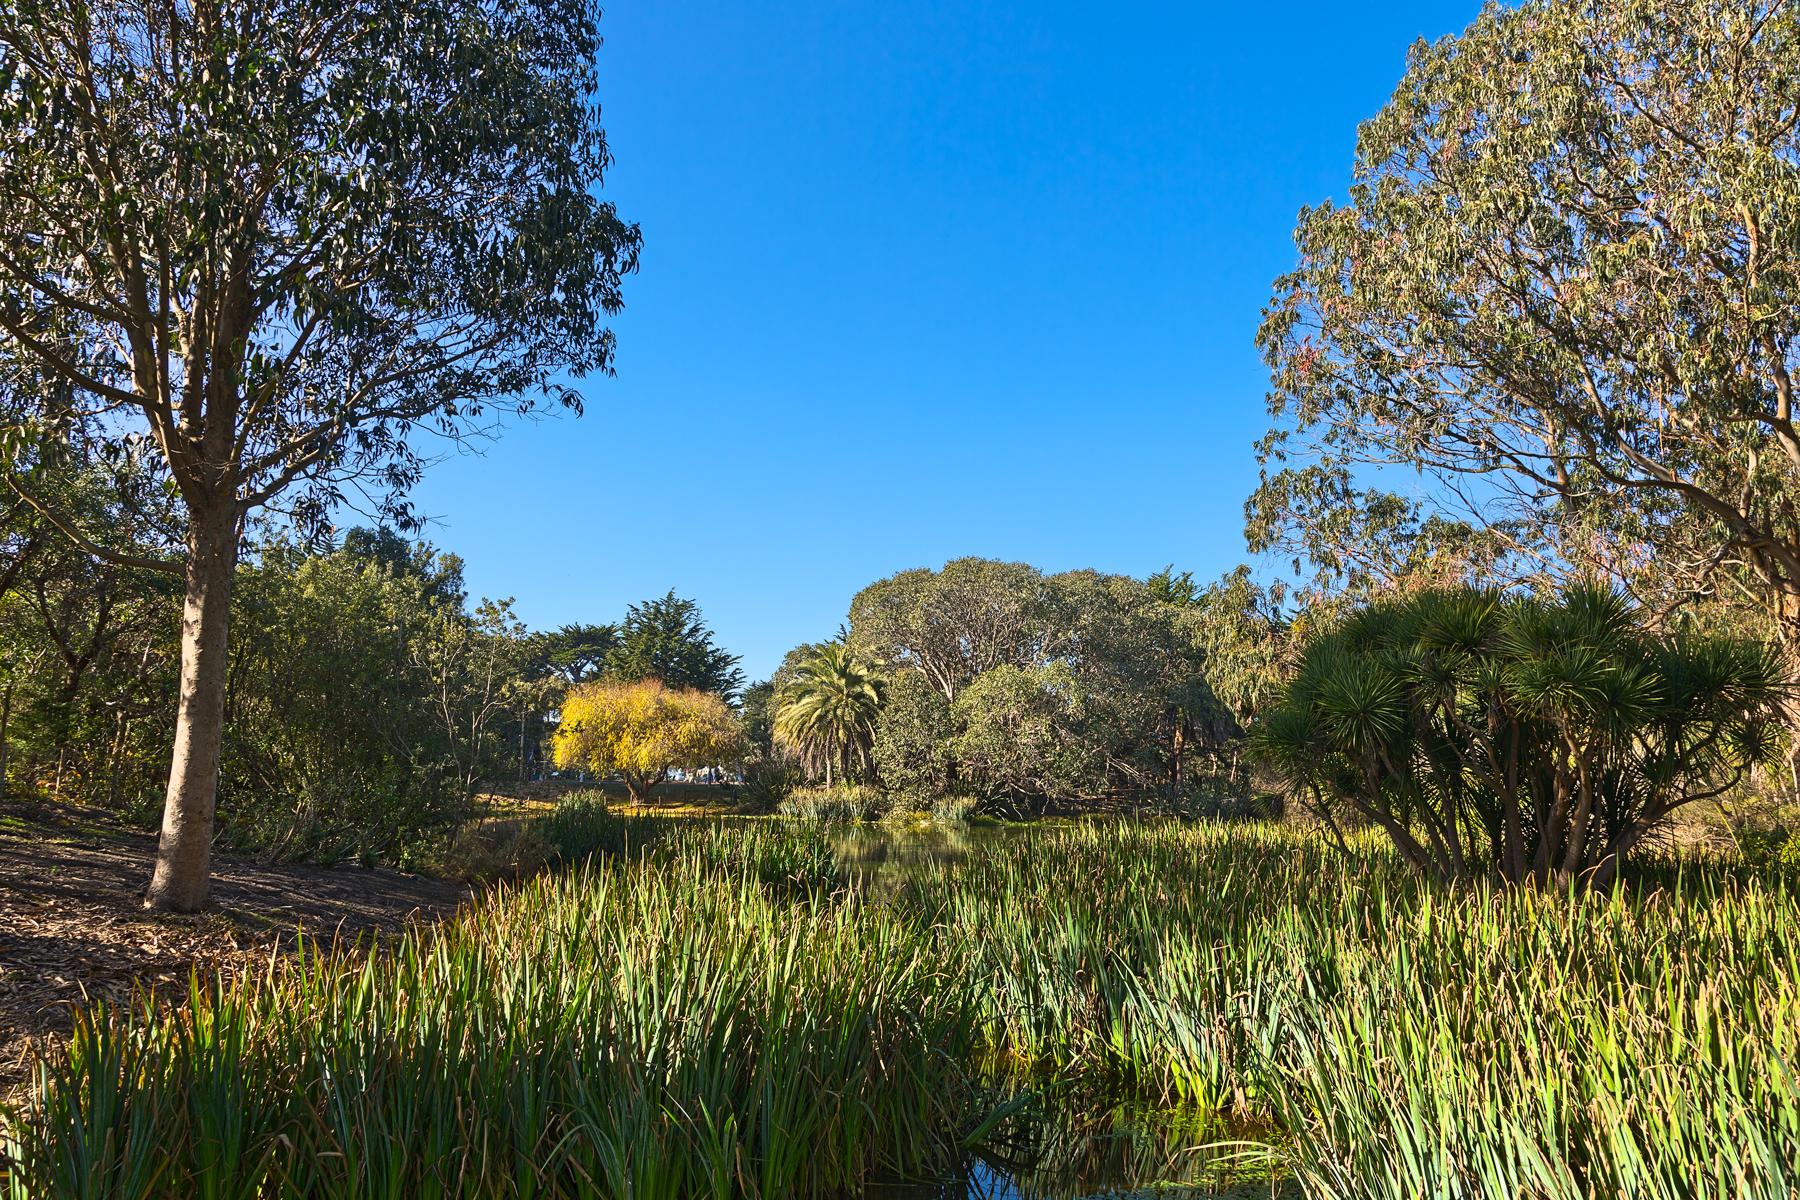 Zoo marsh scenery - hdr photo